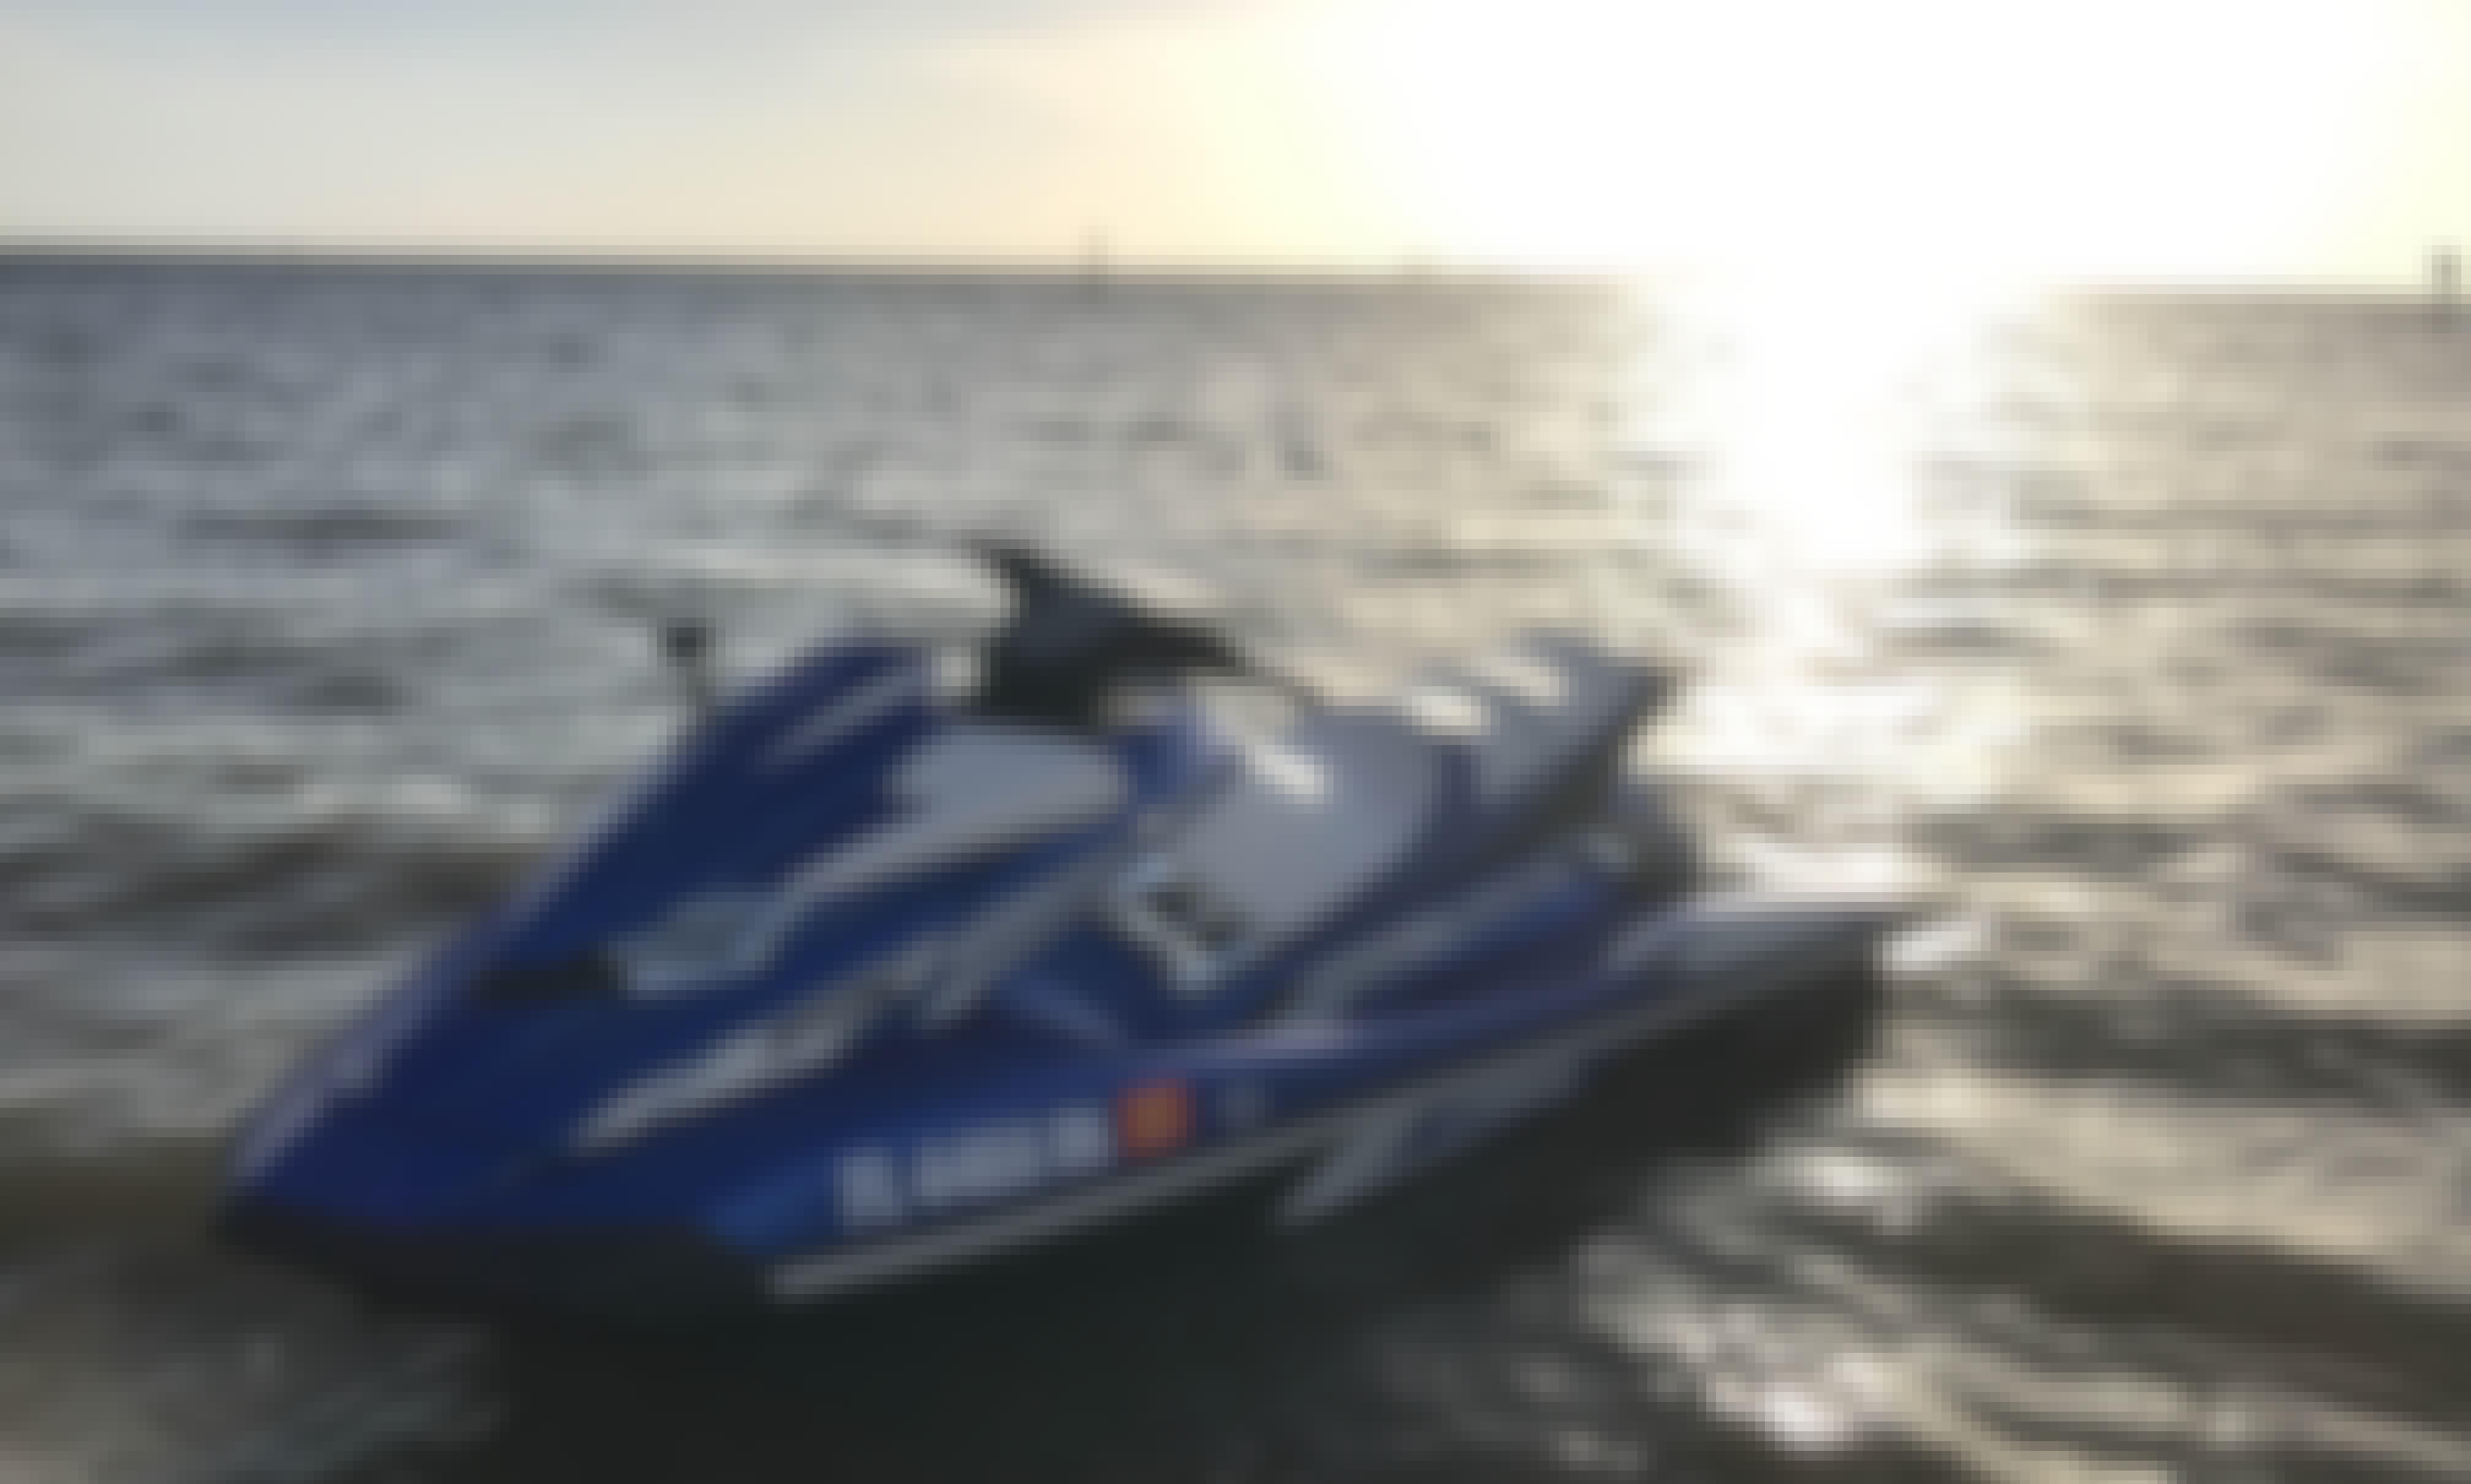 Jet Ski for rent in Tampa, Top-of-the-Line Model, 2017 Yamaha FX SVHO, 70+ mph